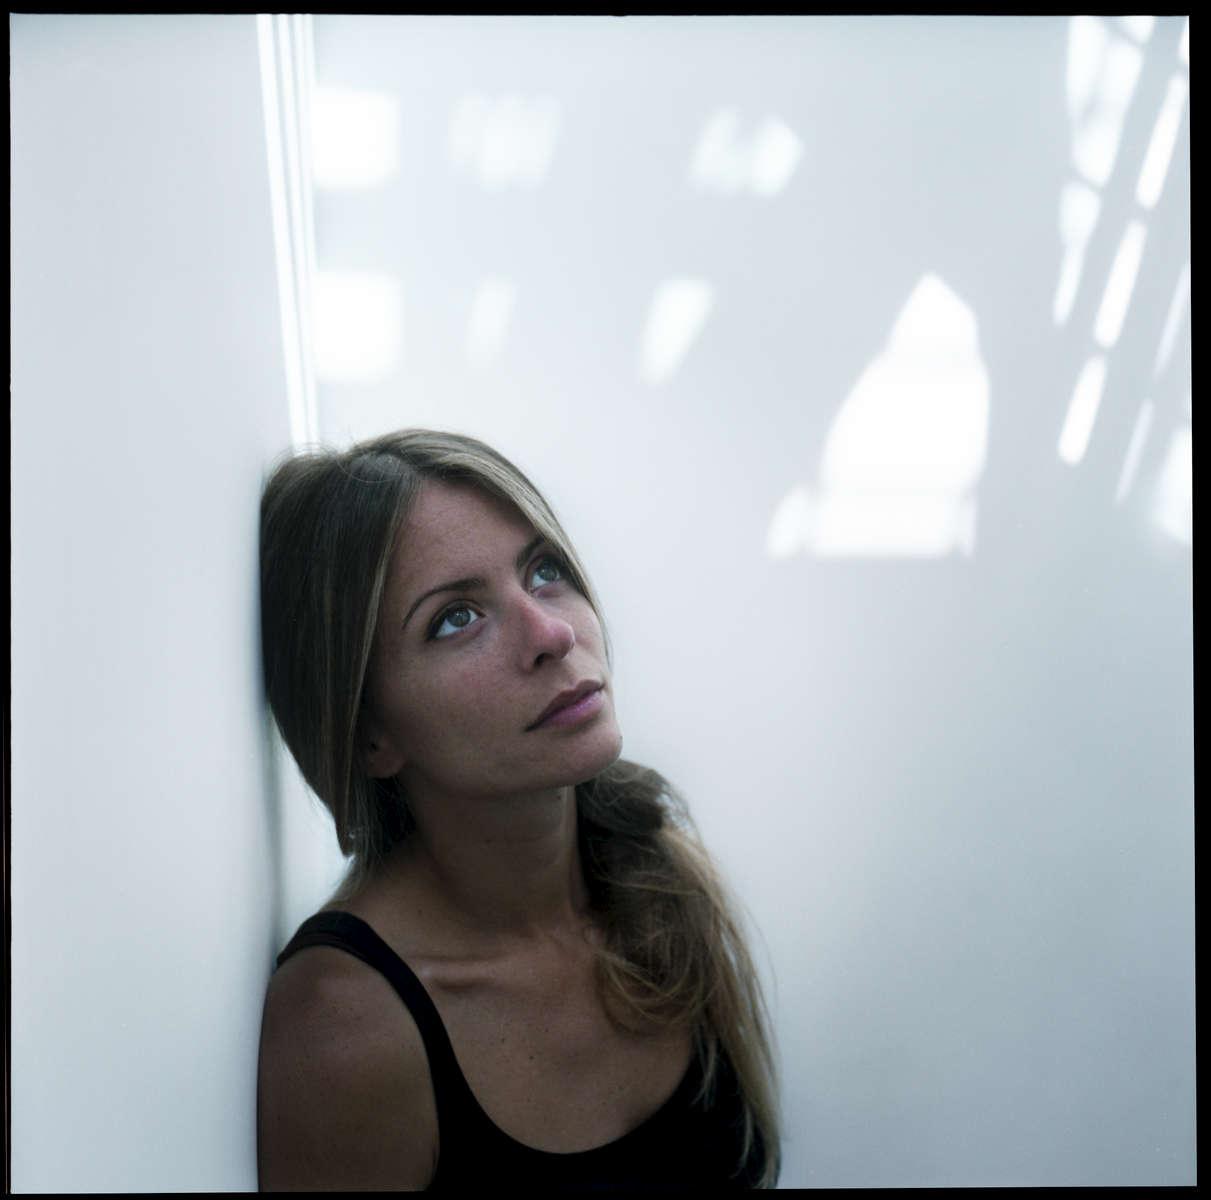 Cristina VatielliPhotographe Italienne, Rome, 2009.